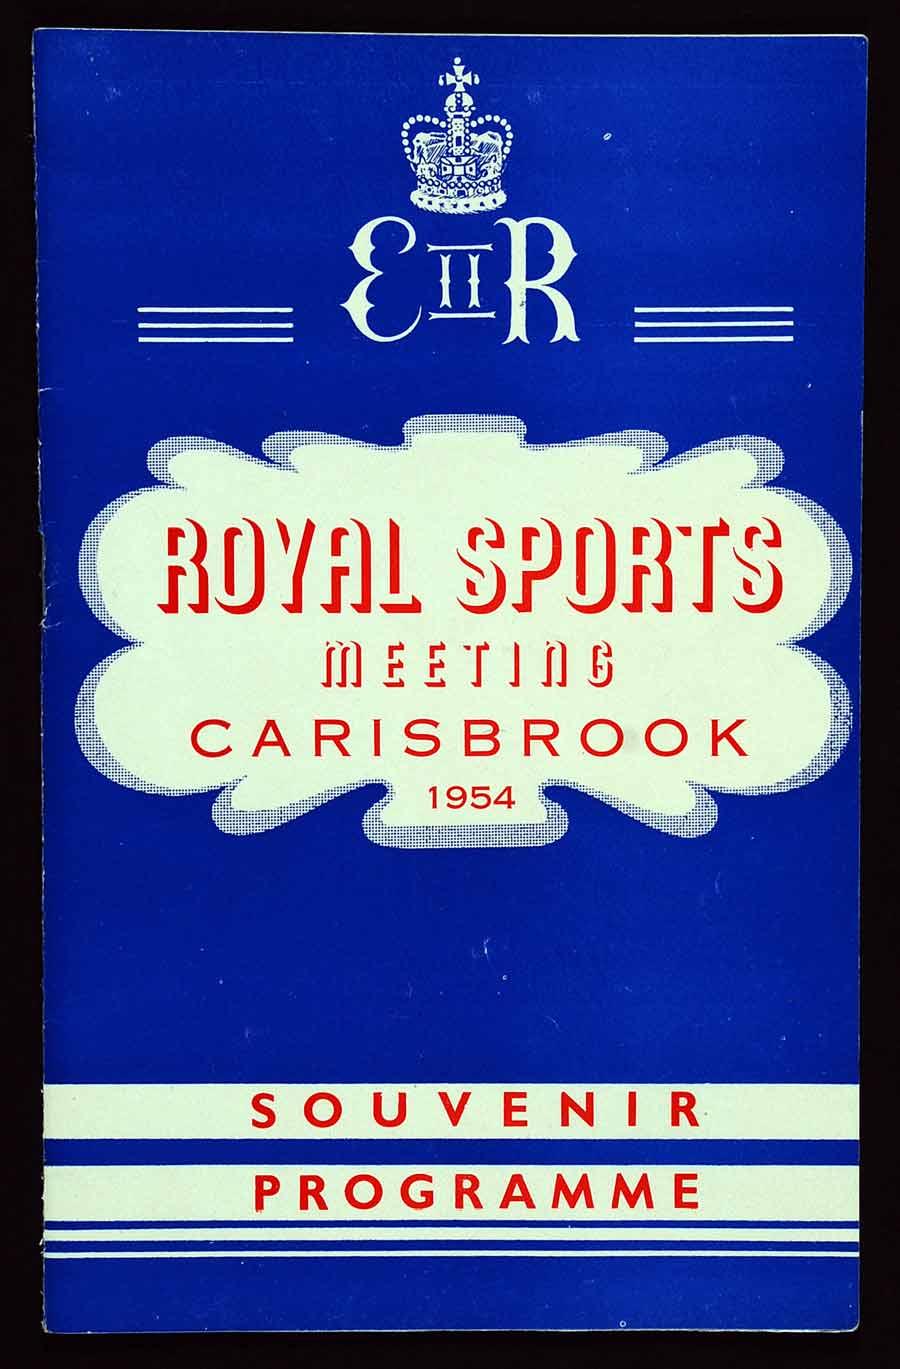 Souvenir programme; royal sports meeting Carisbrook 1954. Dunedin: Printed by Stewart Smith & Hall, [1954].